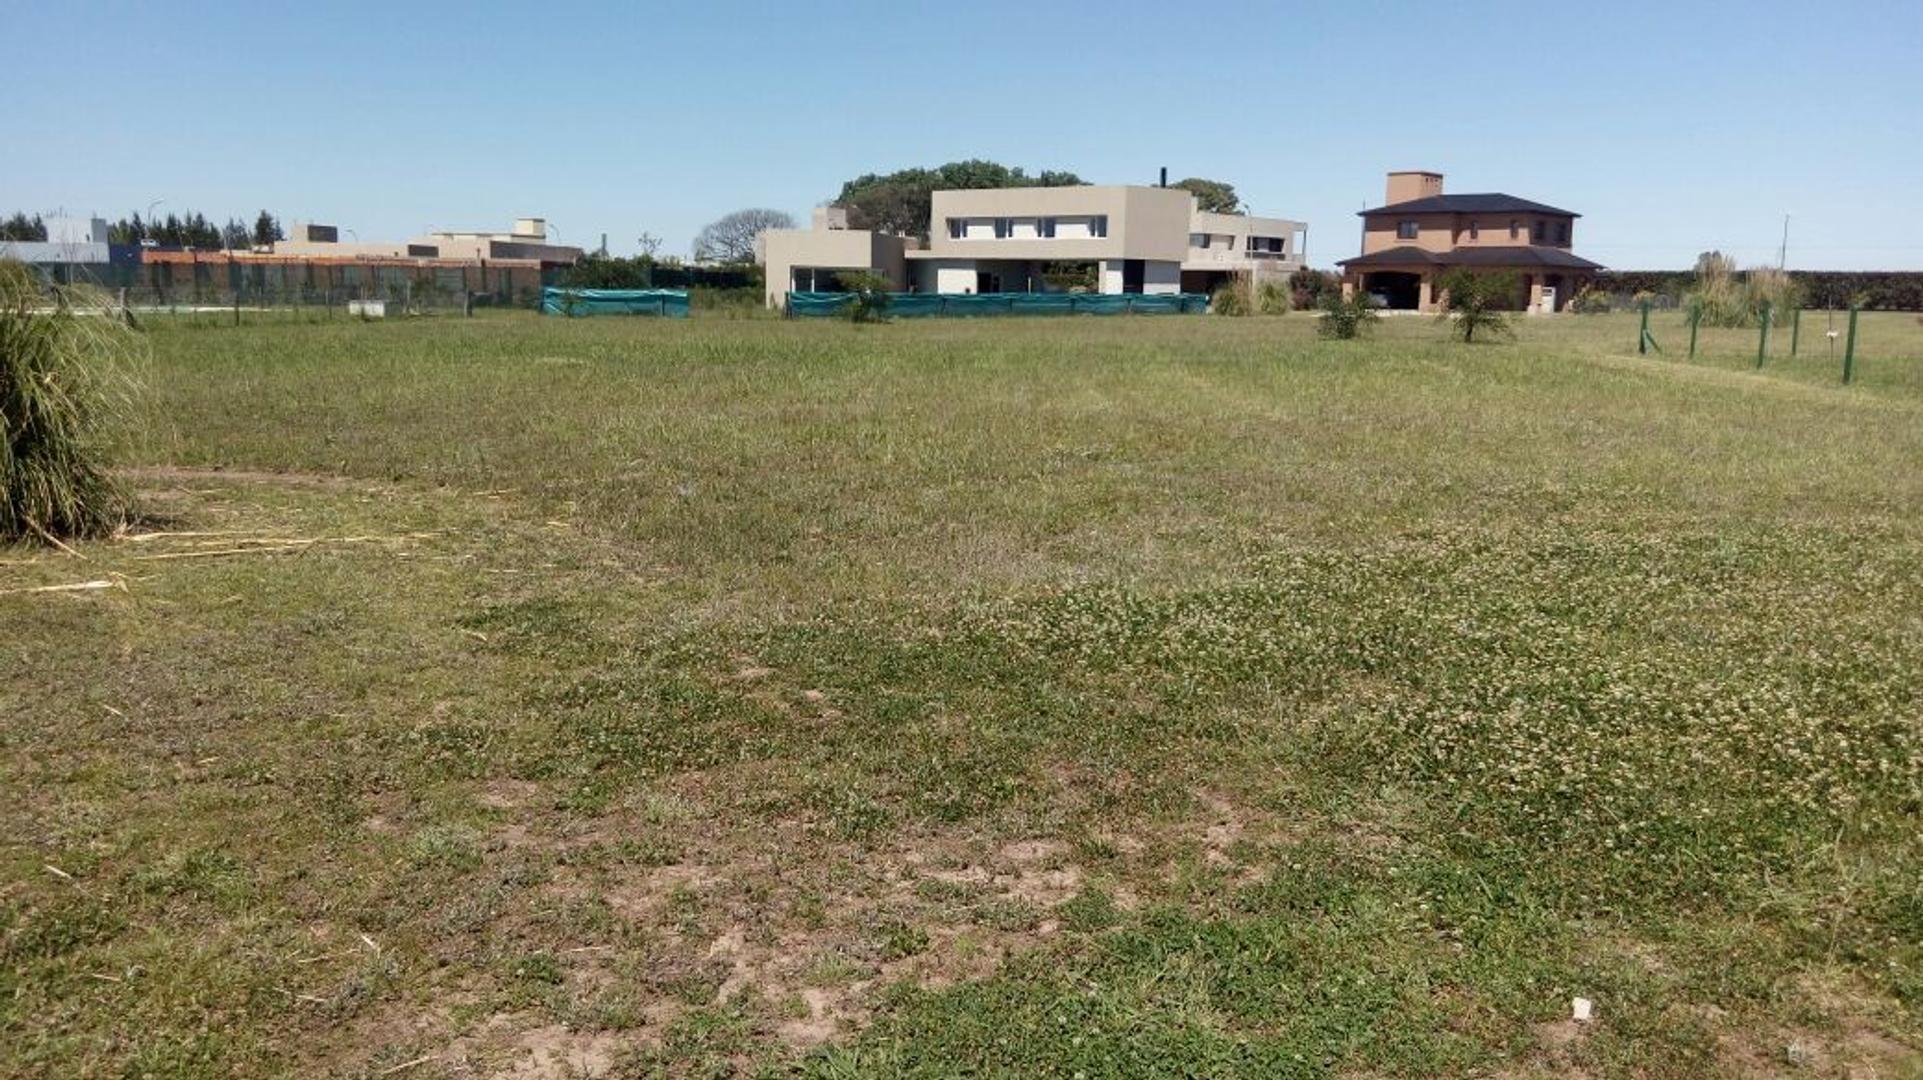 Proyecto de casa de 200 metros en espectacular terreno de mas de 1000 metros en Cul de Sac